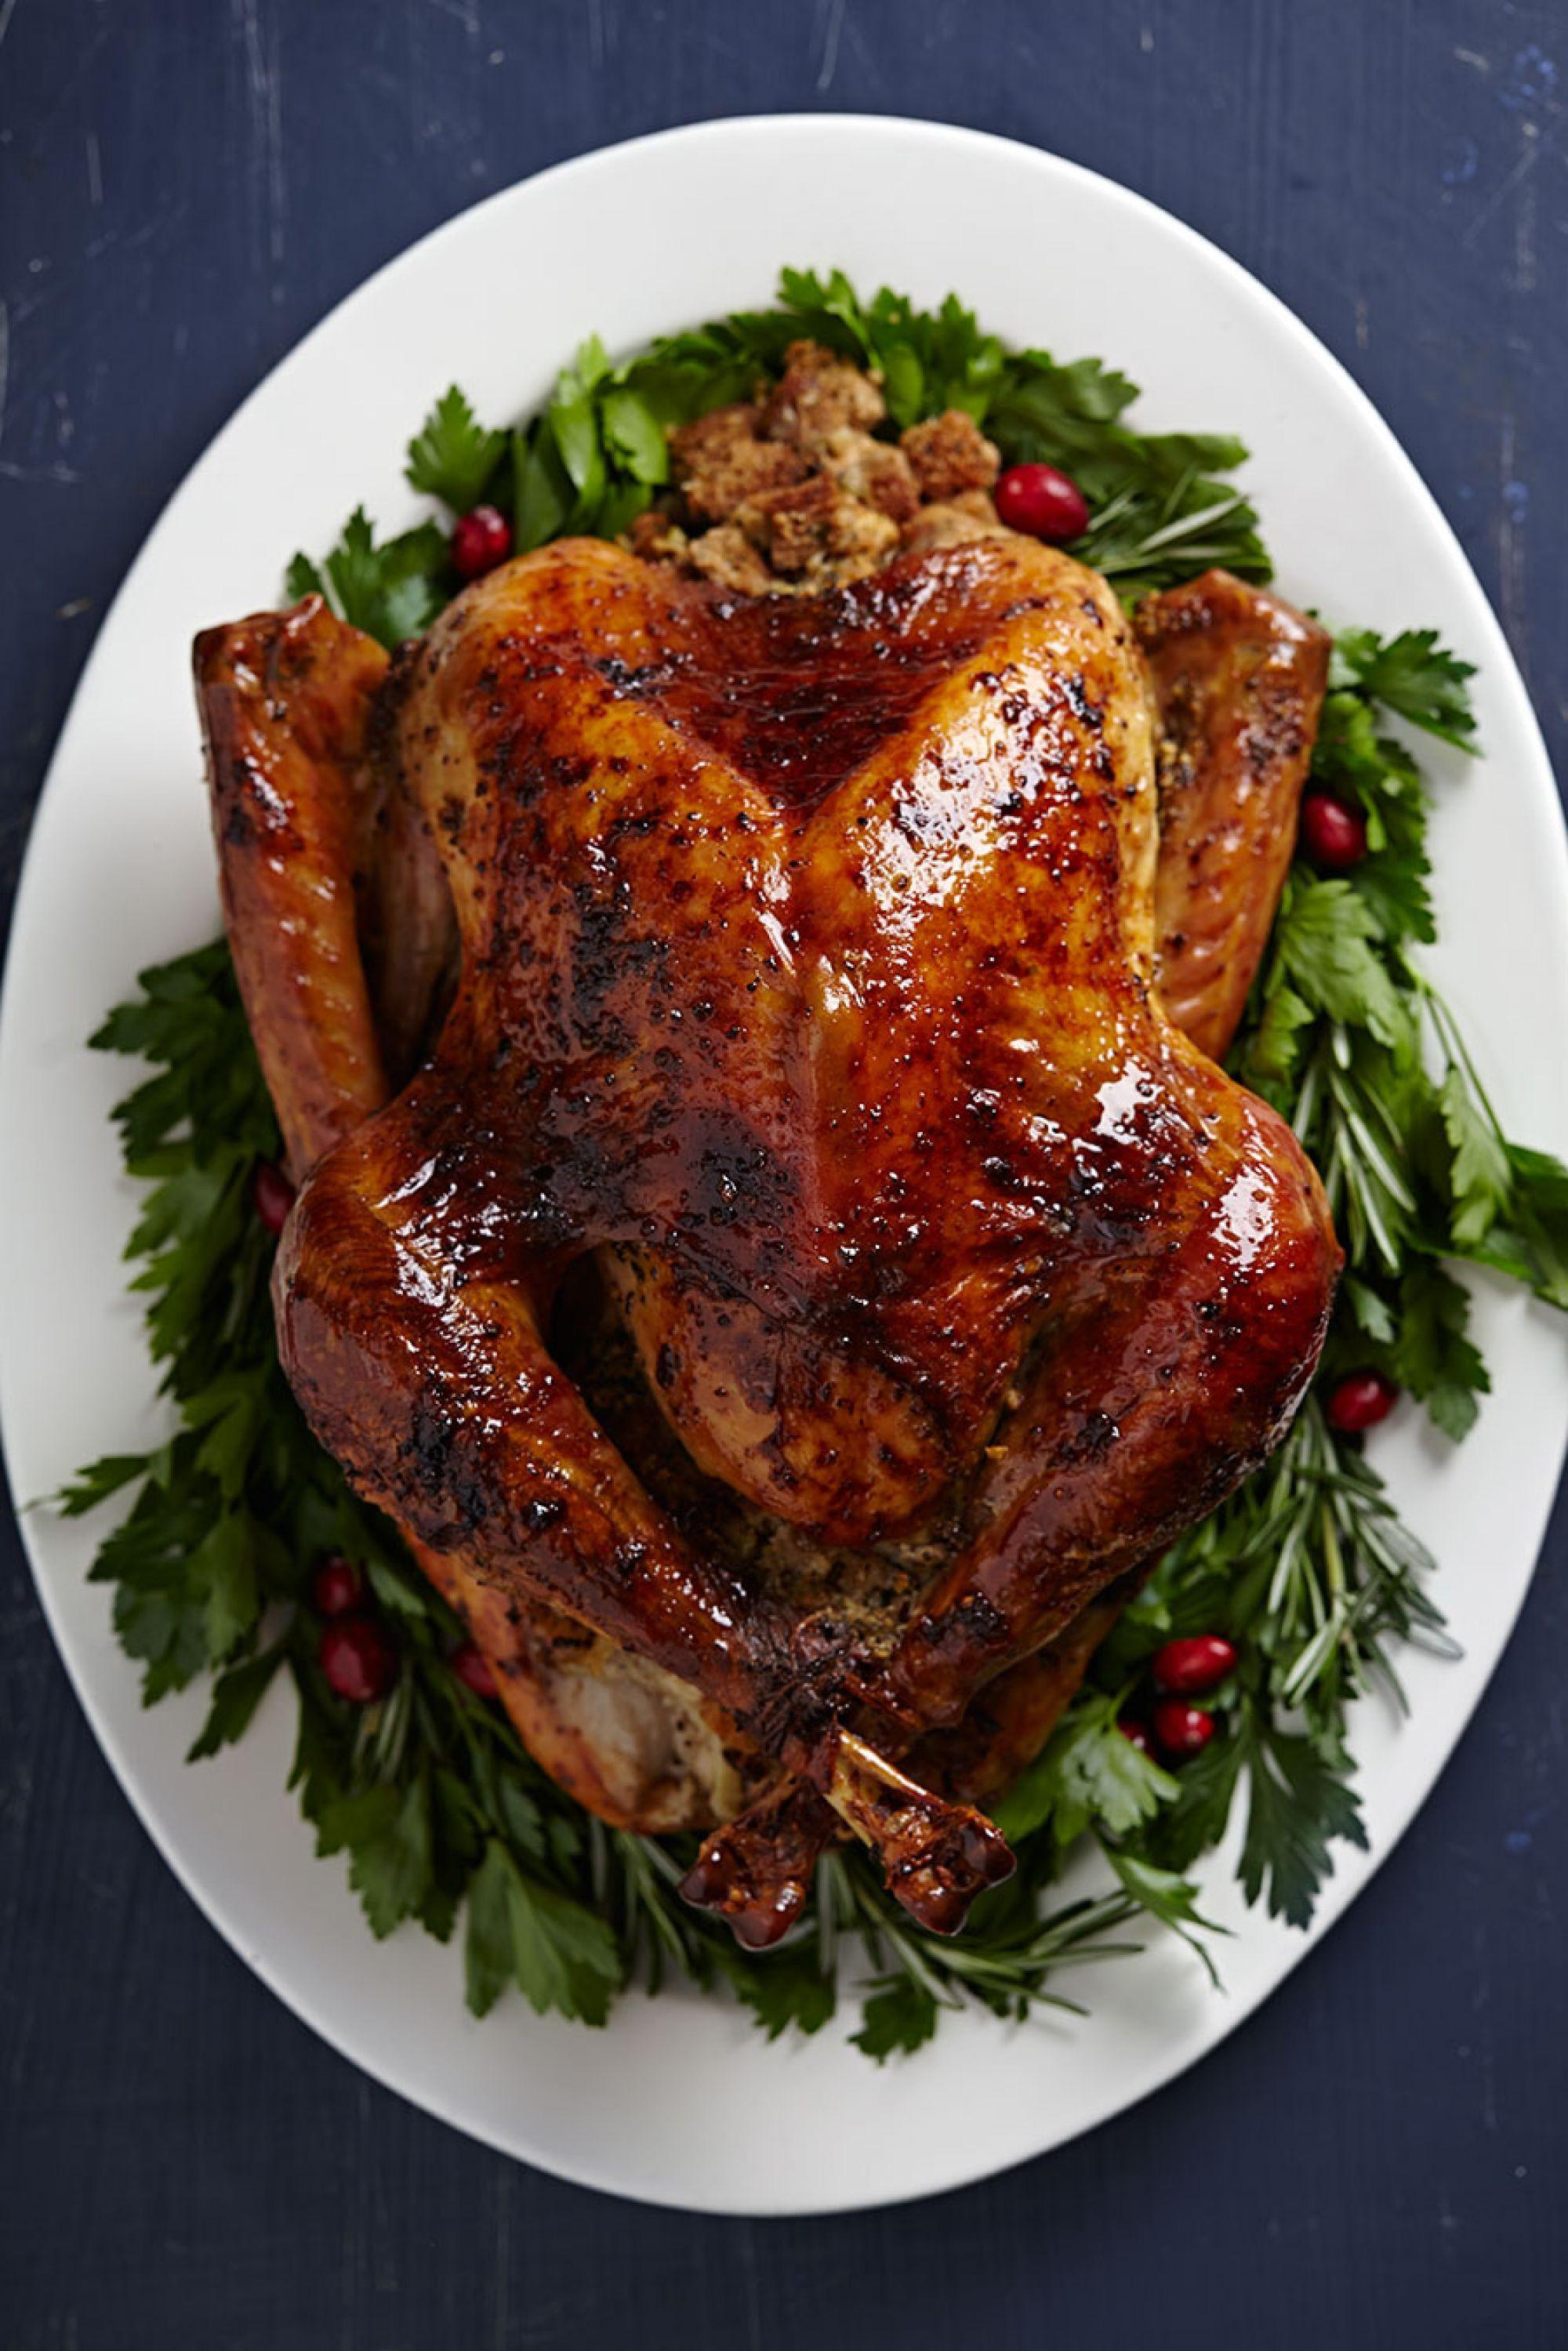 Roasted Turkey Recipes Thanksgiving  Planning a Thanksgiving Menu 25 Amazing Recipes